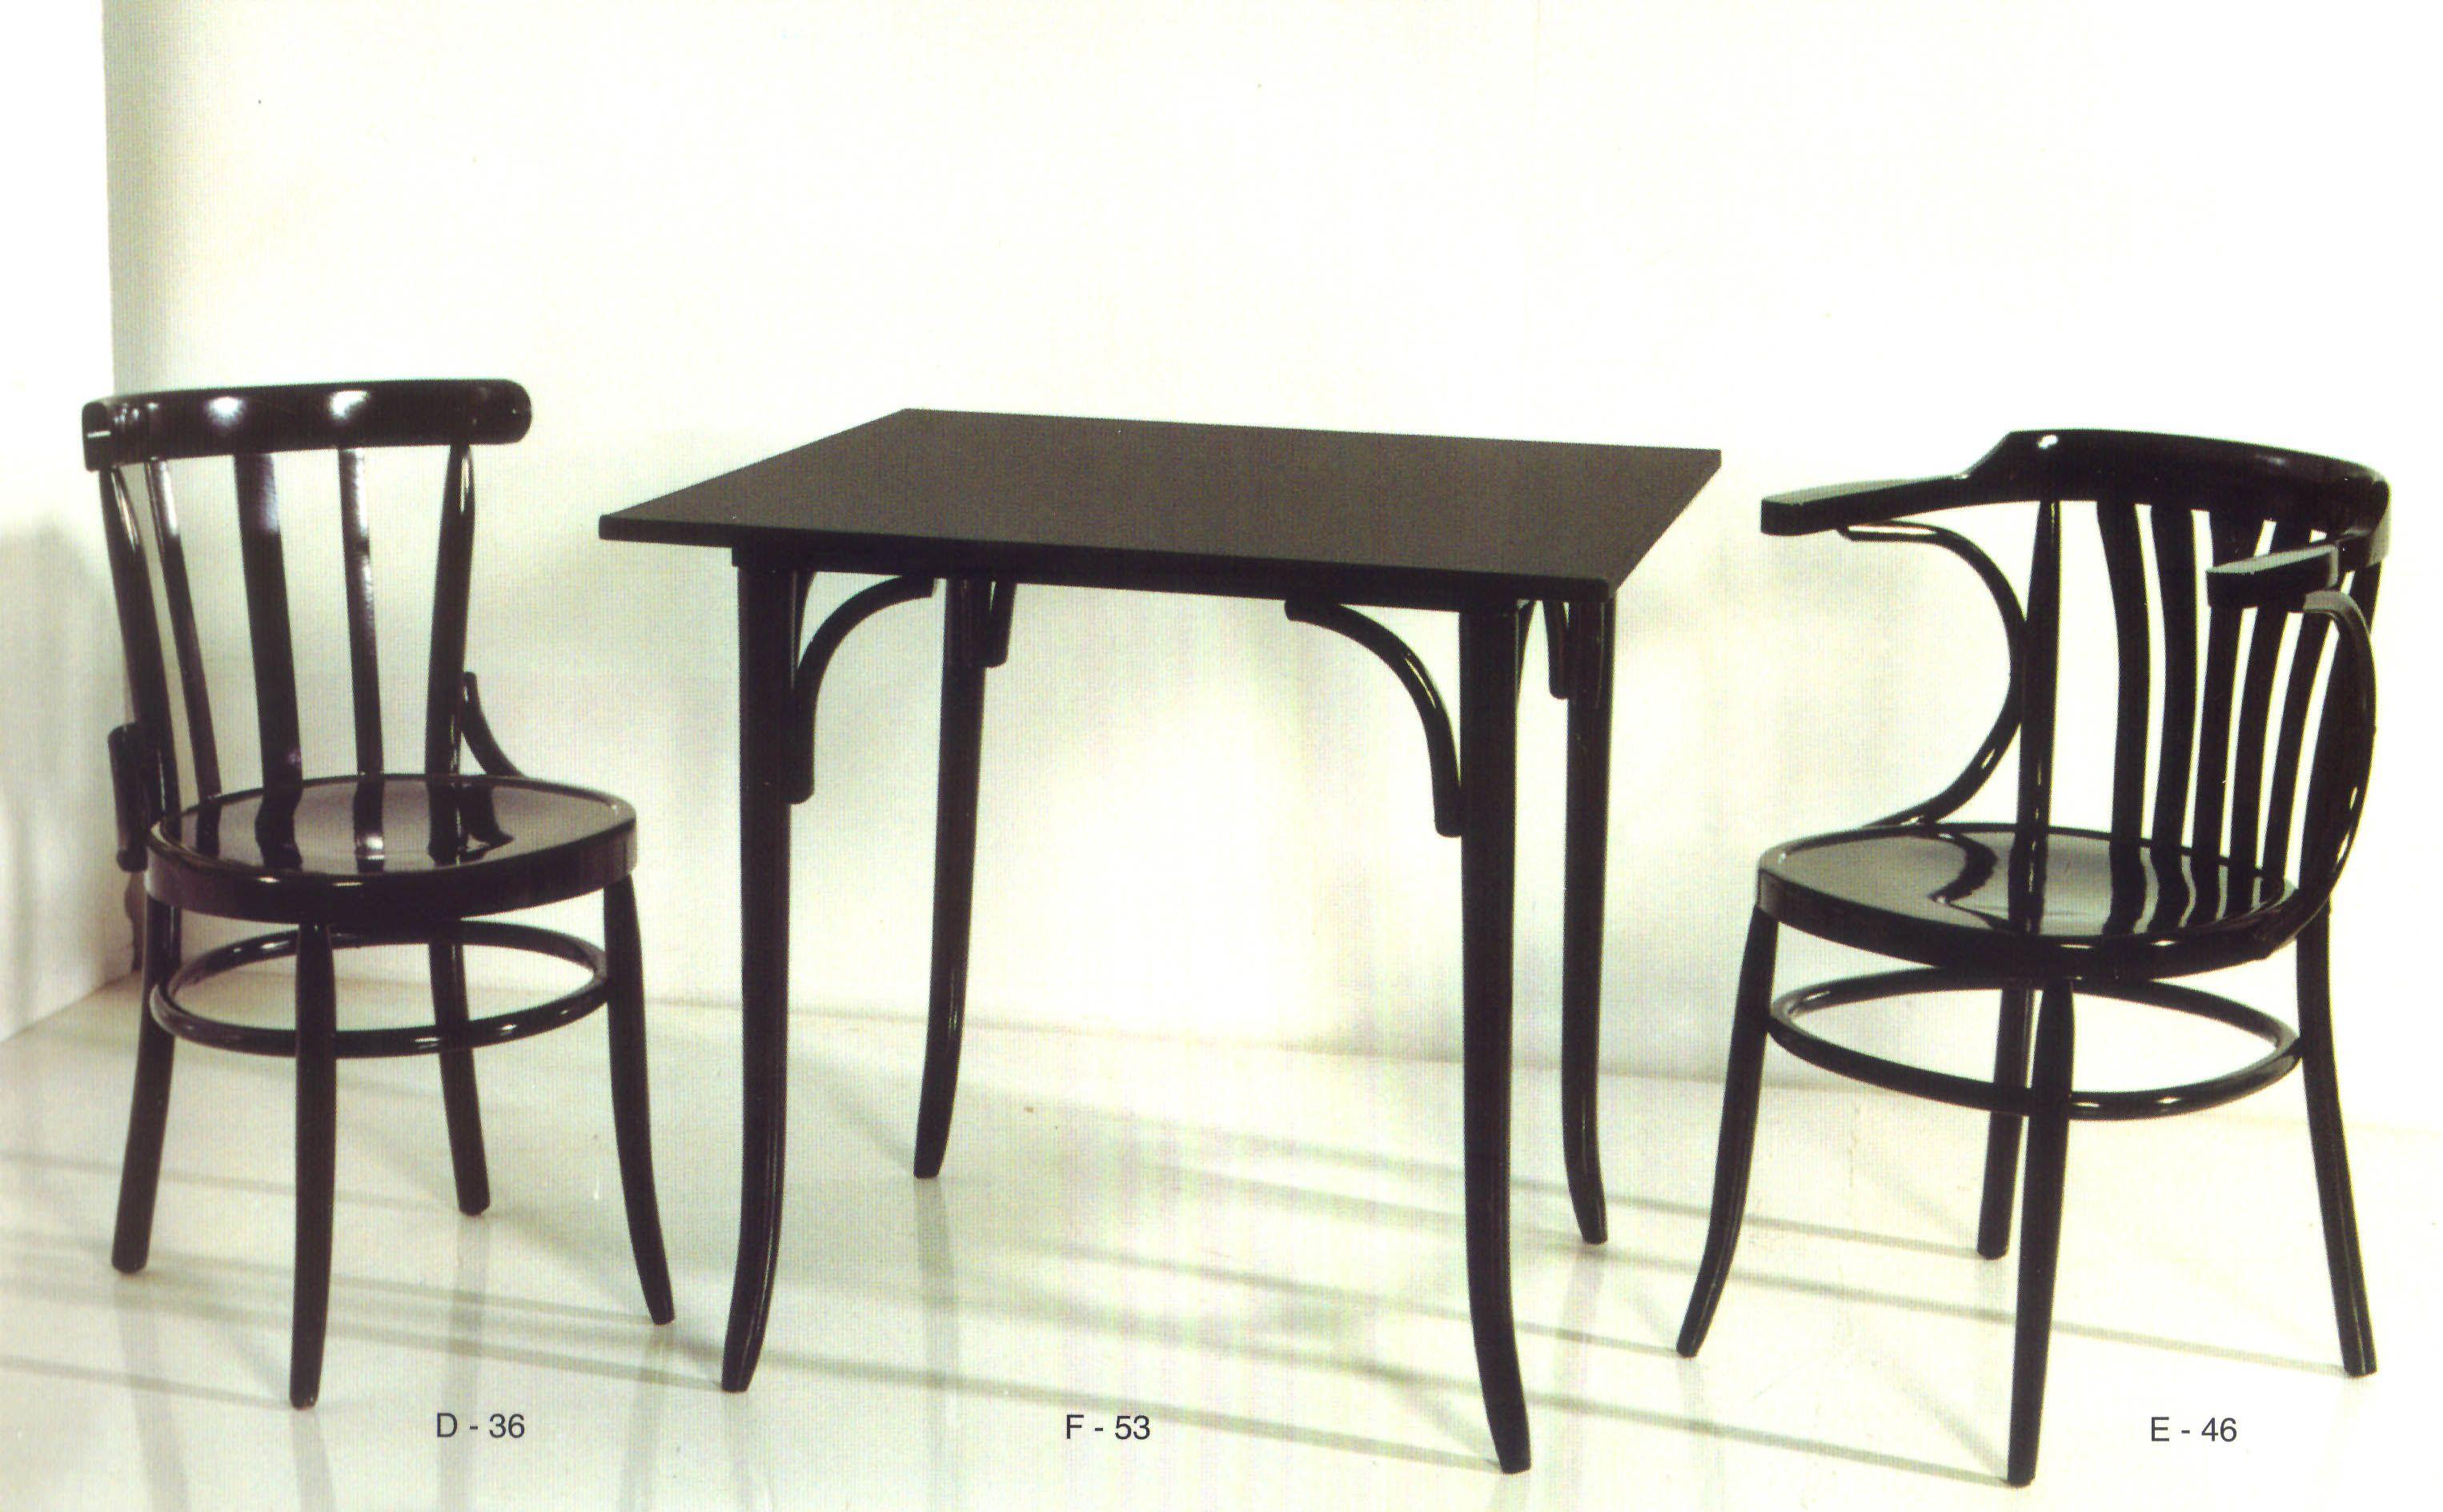 Mesas centro y sillas de madera de haya para casa o para